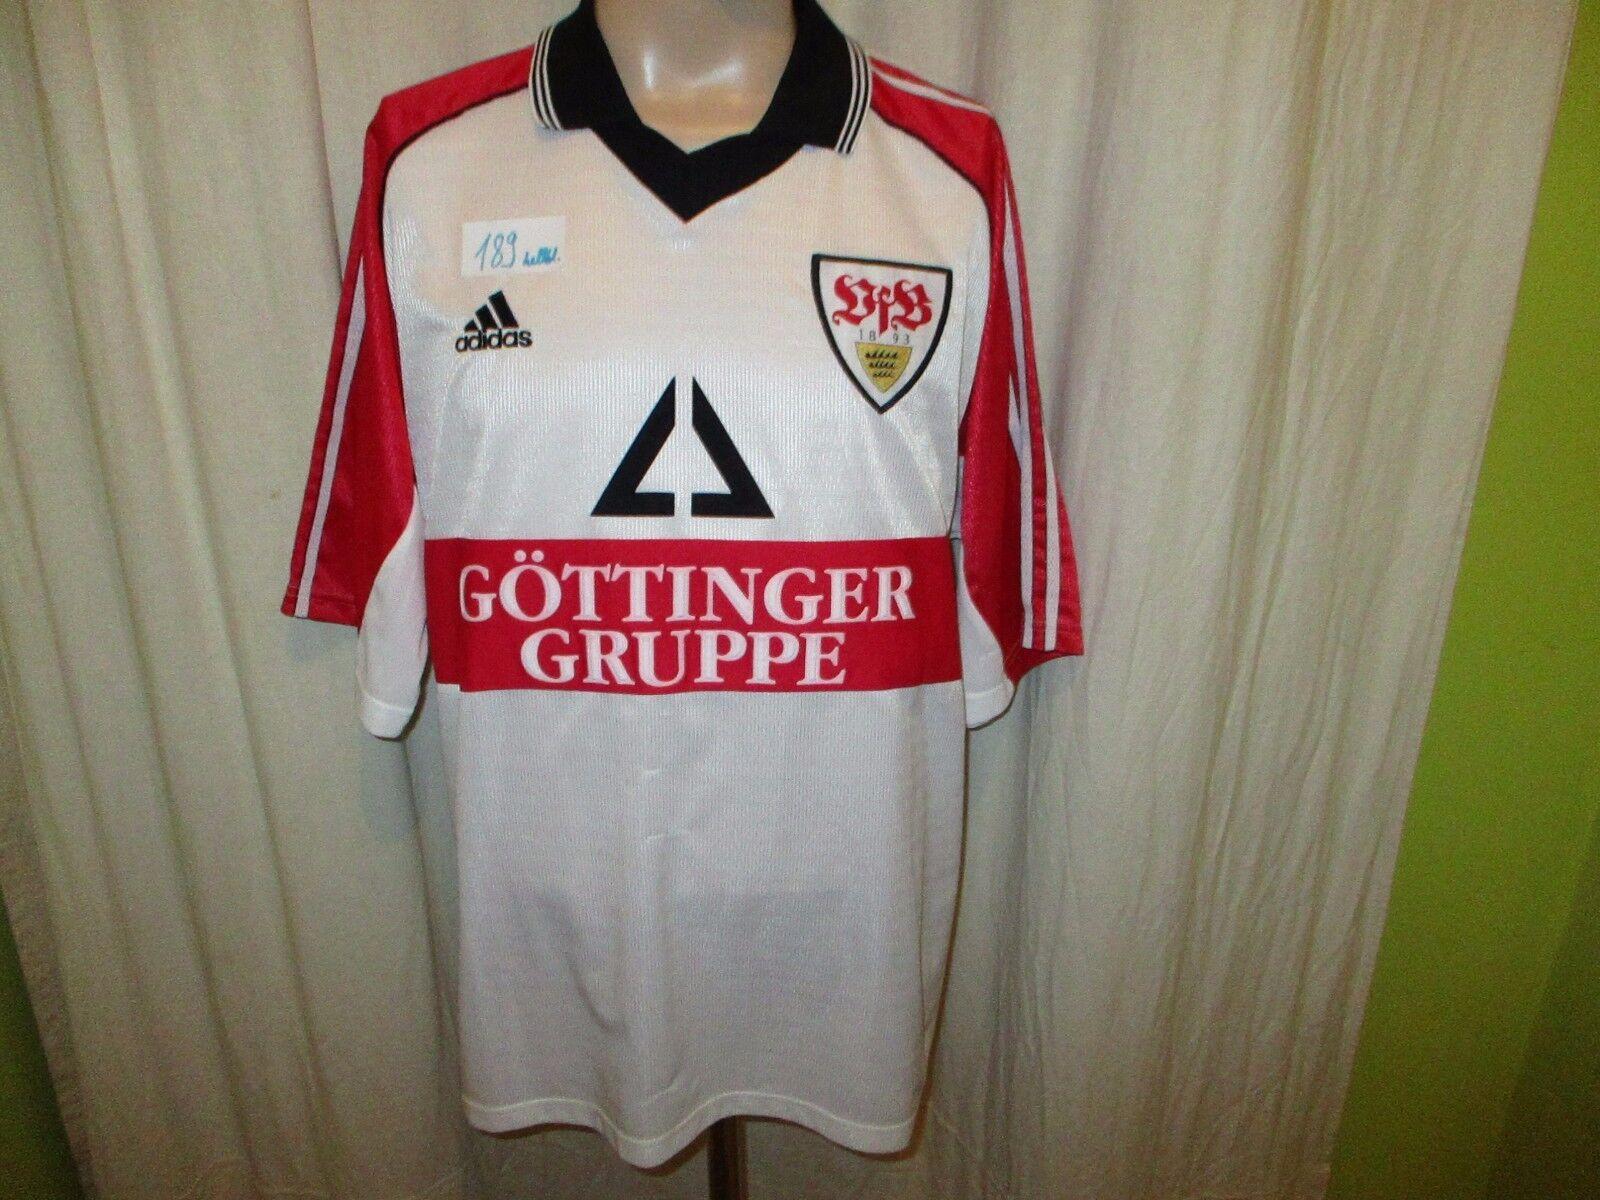 VfB Stuttgart Adidas Trikot 1998 99    Göttinger Gruppe  + Nr.8 Zeyer Gr.XL TOP  | Realistisch  0239fb